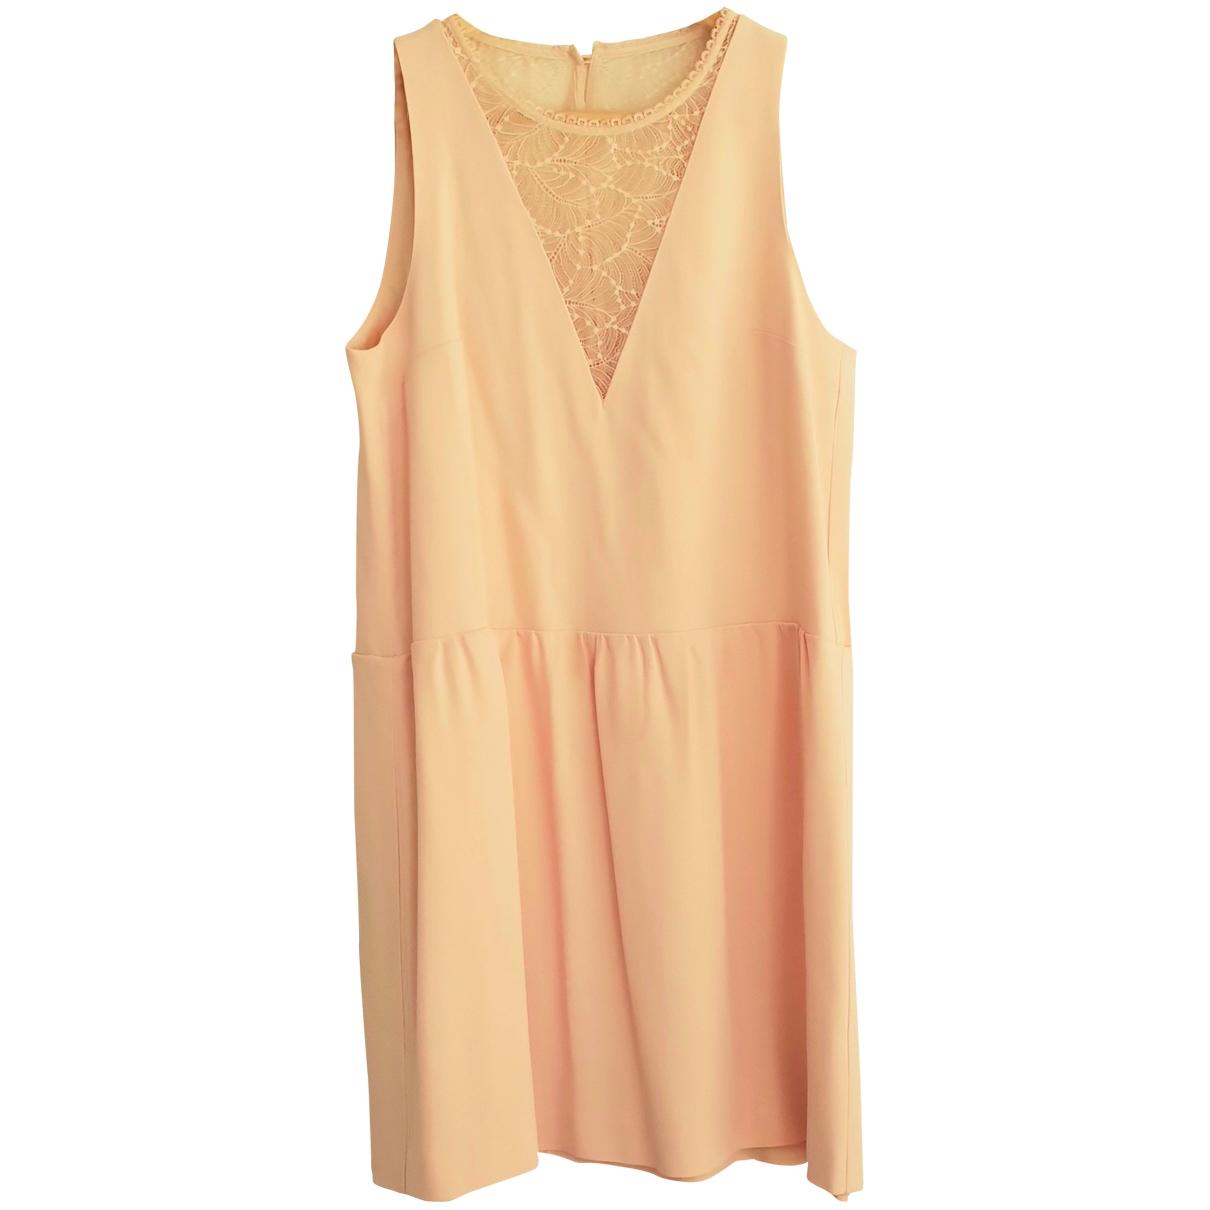 Sezane Spring Summer 2019 Kleid in  Beige Viskose